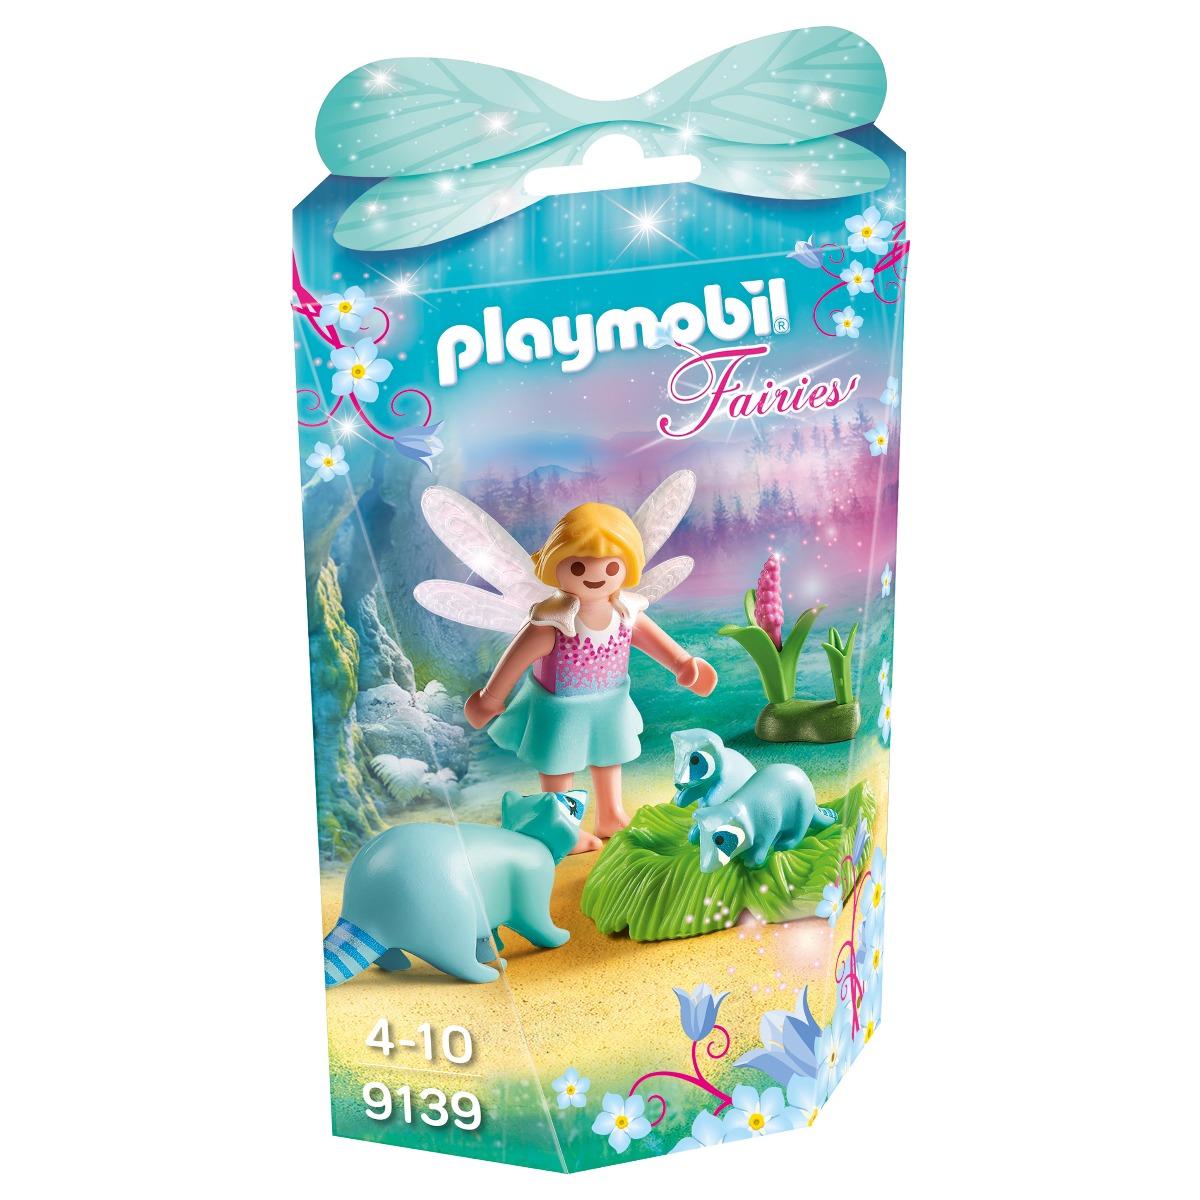 set figurine playmobil fairies - zana cu ratoni (9139)